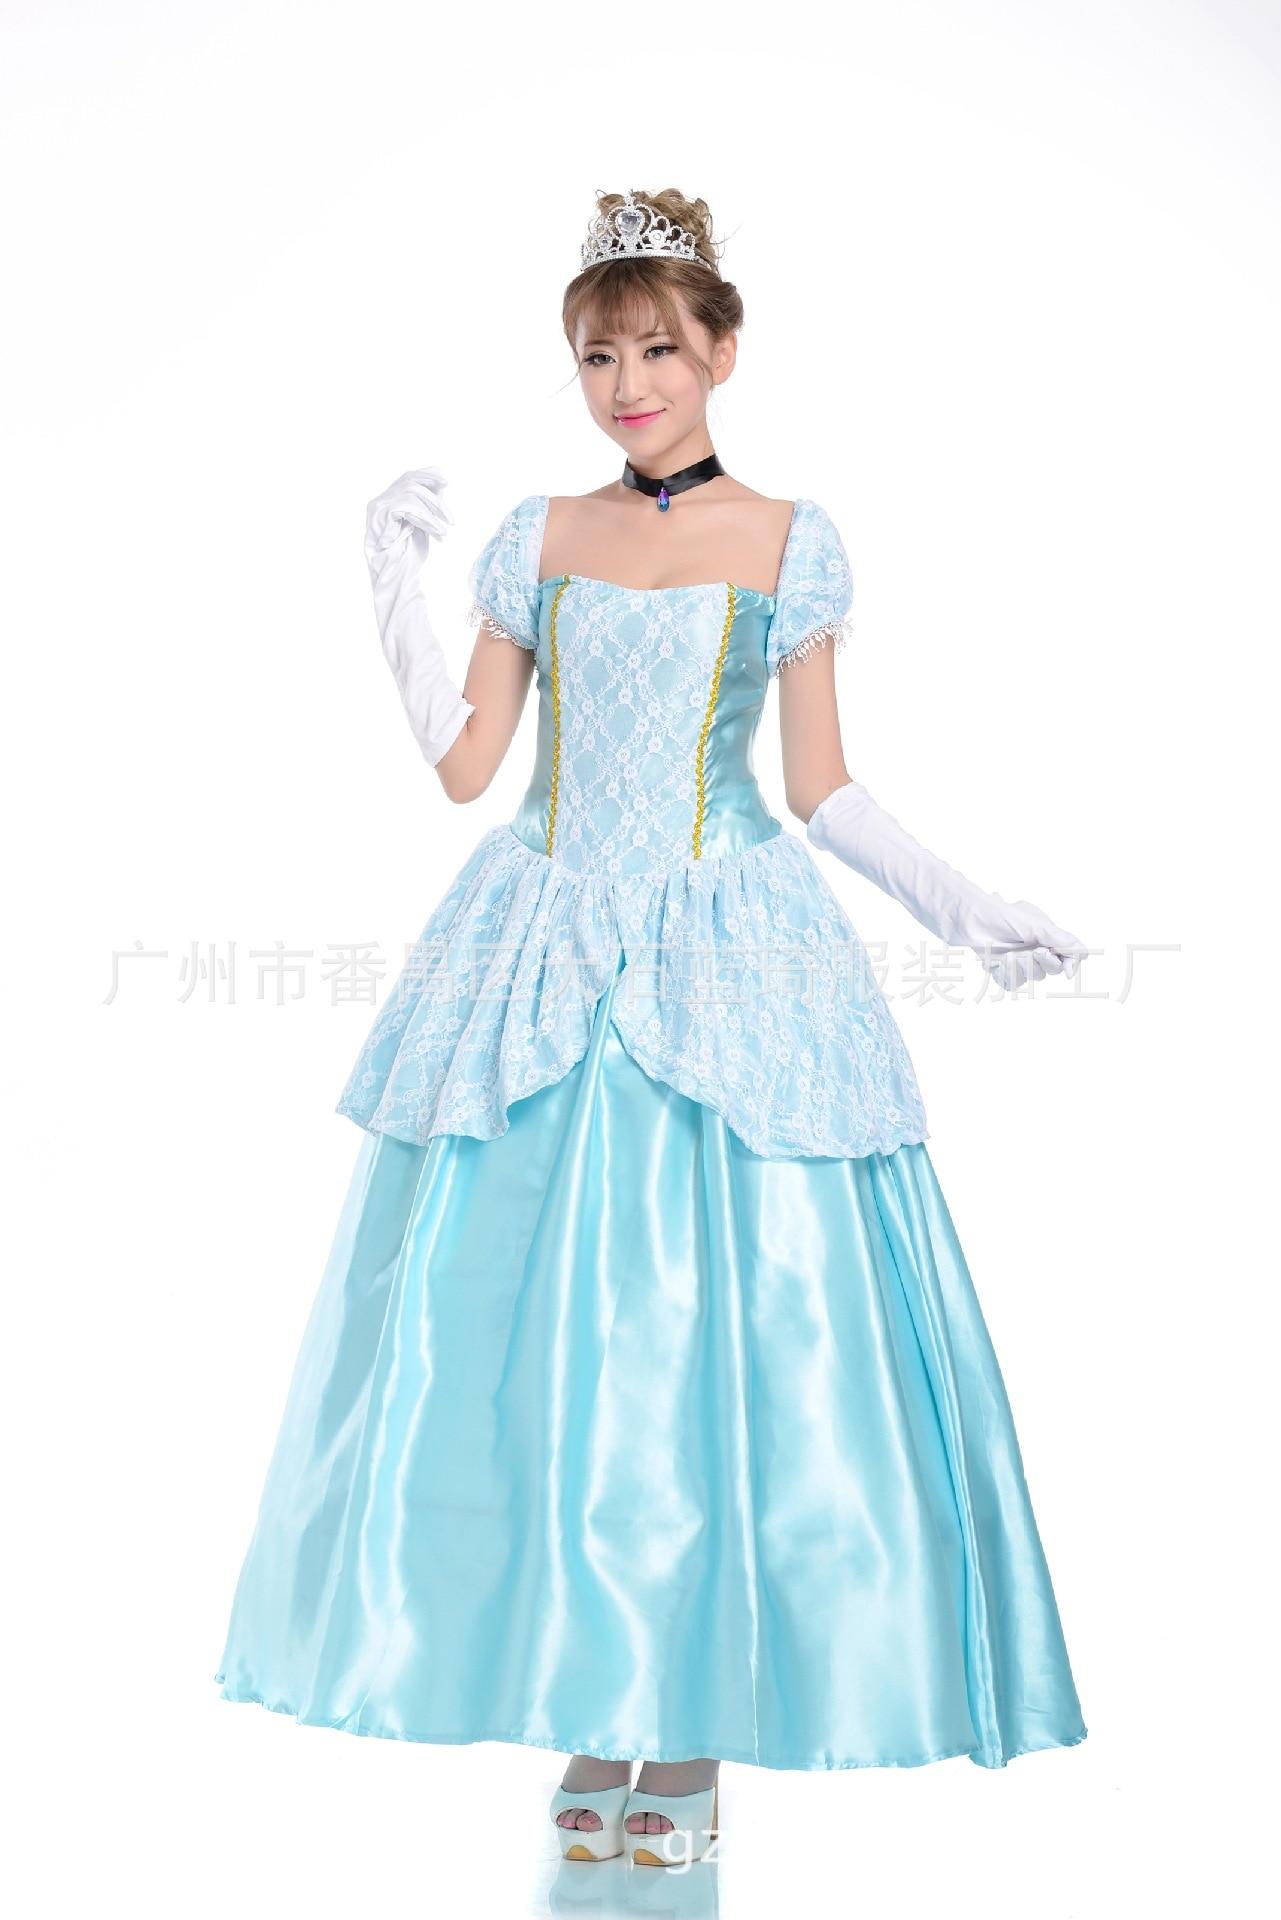 White apron alice wonderland costume - Halloween Costumes Womens Adult Alice Wonderland Costume Suit Maids Lolita Fancy Dress Cosplay Snow White For